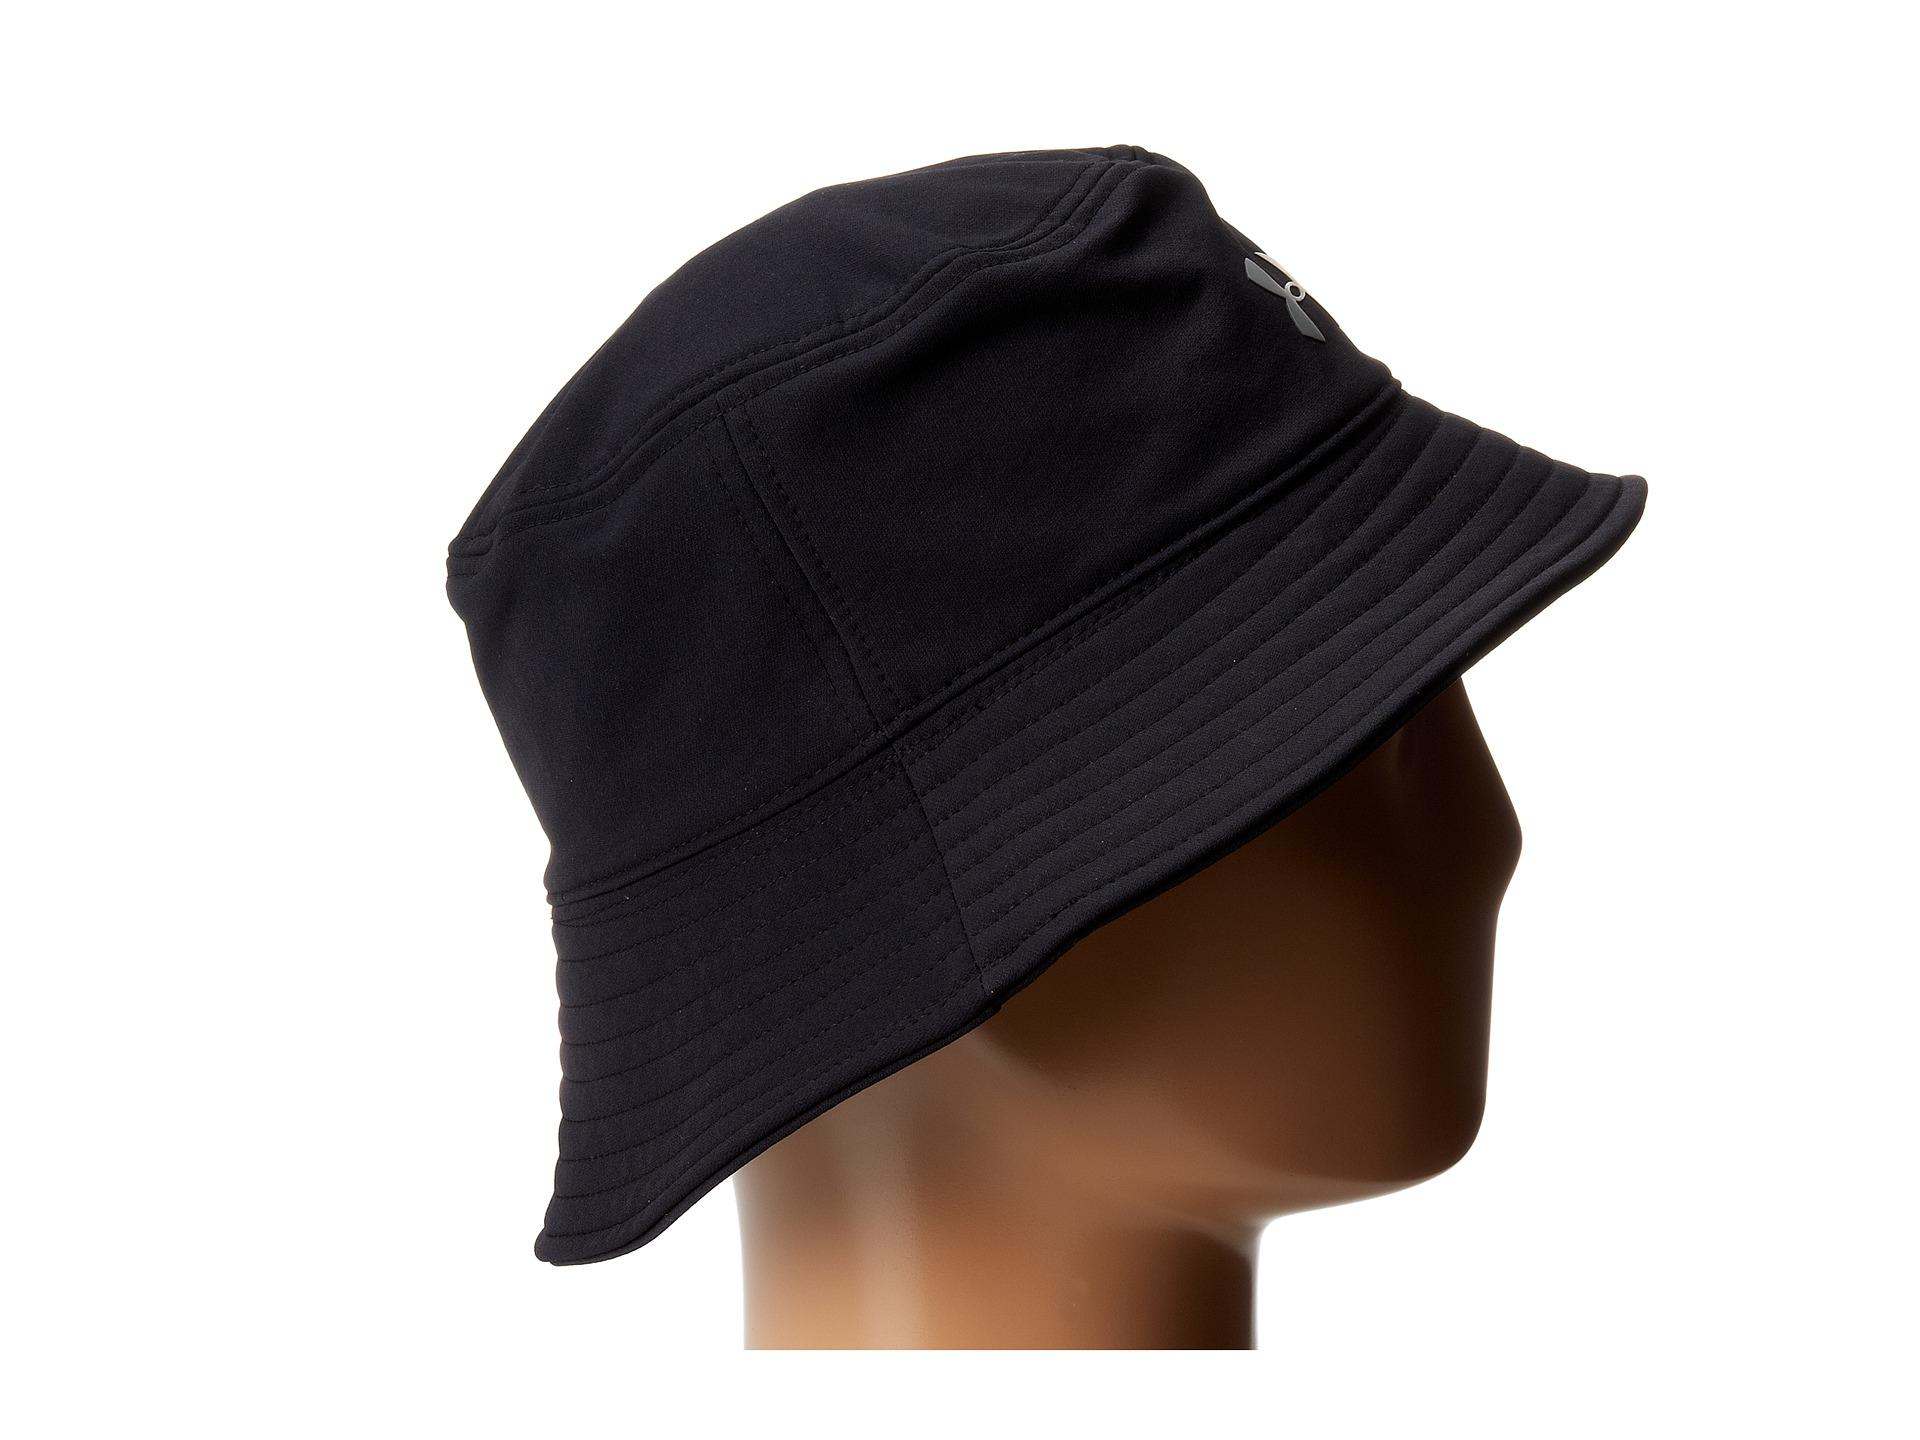 2faa20c8a0ad1 ireland under armour bucket hat canada 7554c fdafe